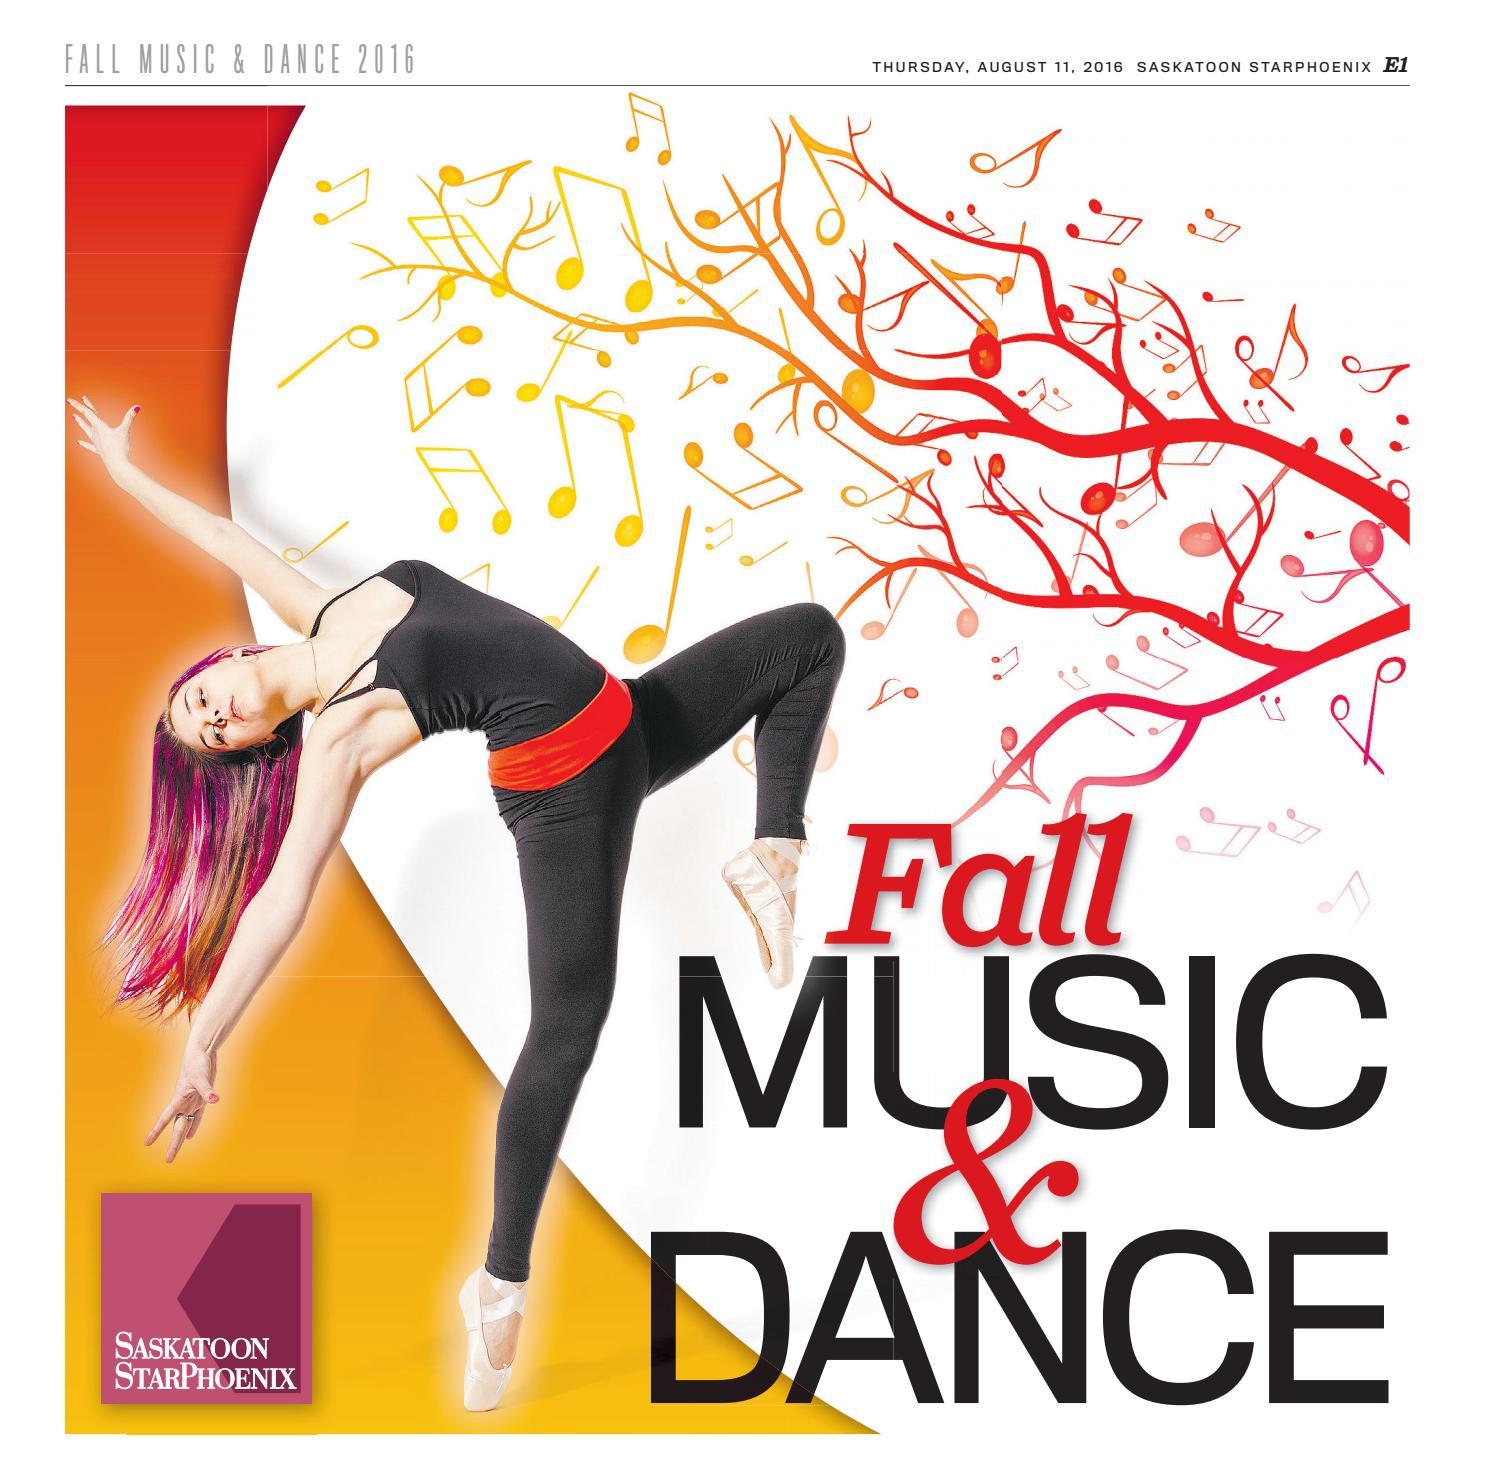 Saskatoon Fall Music & Dance 2016 by Postmedia Saskatchewan